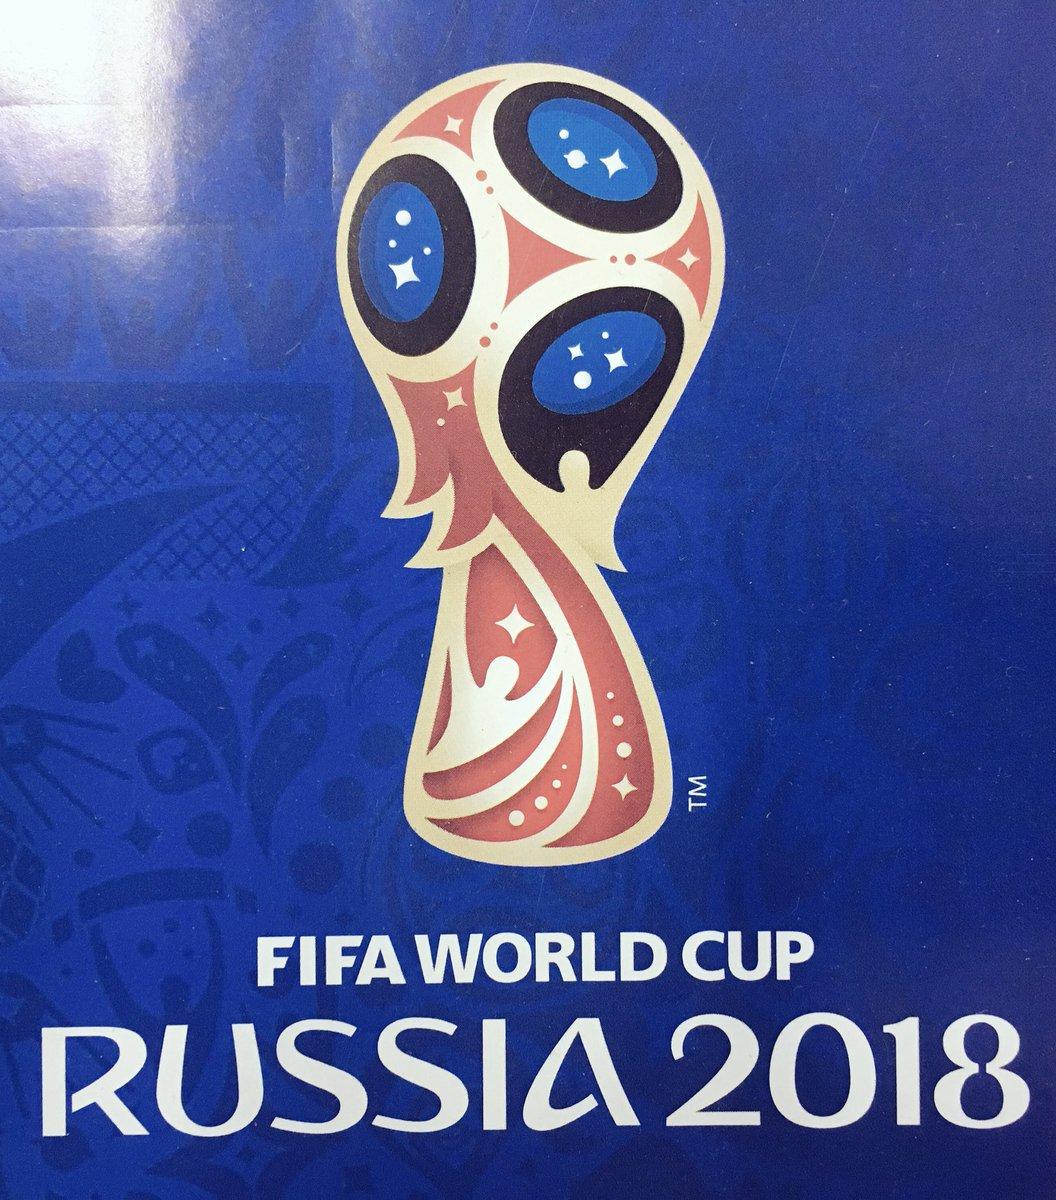 2018 fifa world cup russia - HD1056×1200